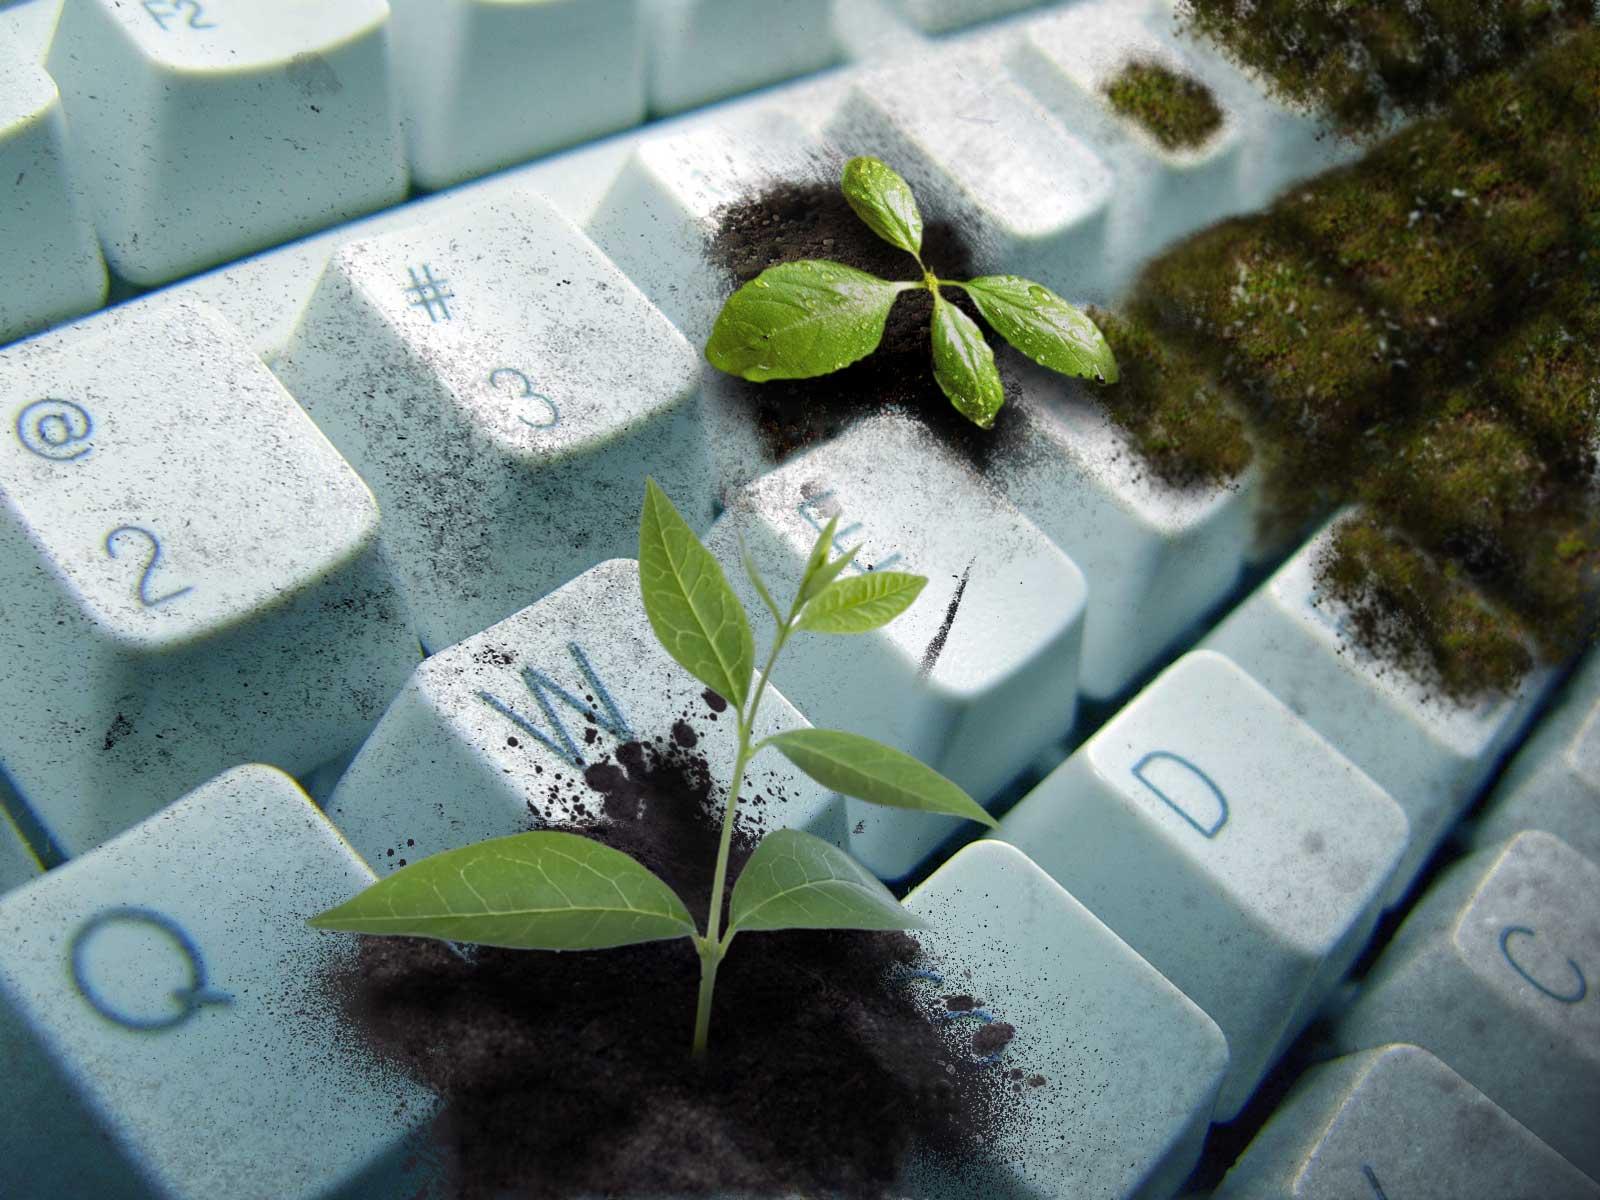 Nature vs Technology আমার সংগ্রহের ট্রেকি ফানি কিছু শেয়ার করলাম ।দেখলে অনেক মজা পাবেন , না দেখলে মিস করবেন ।